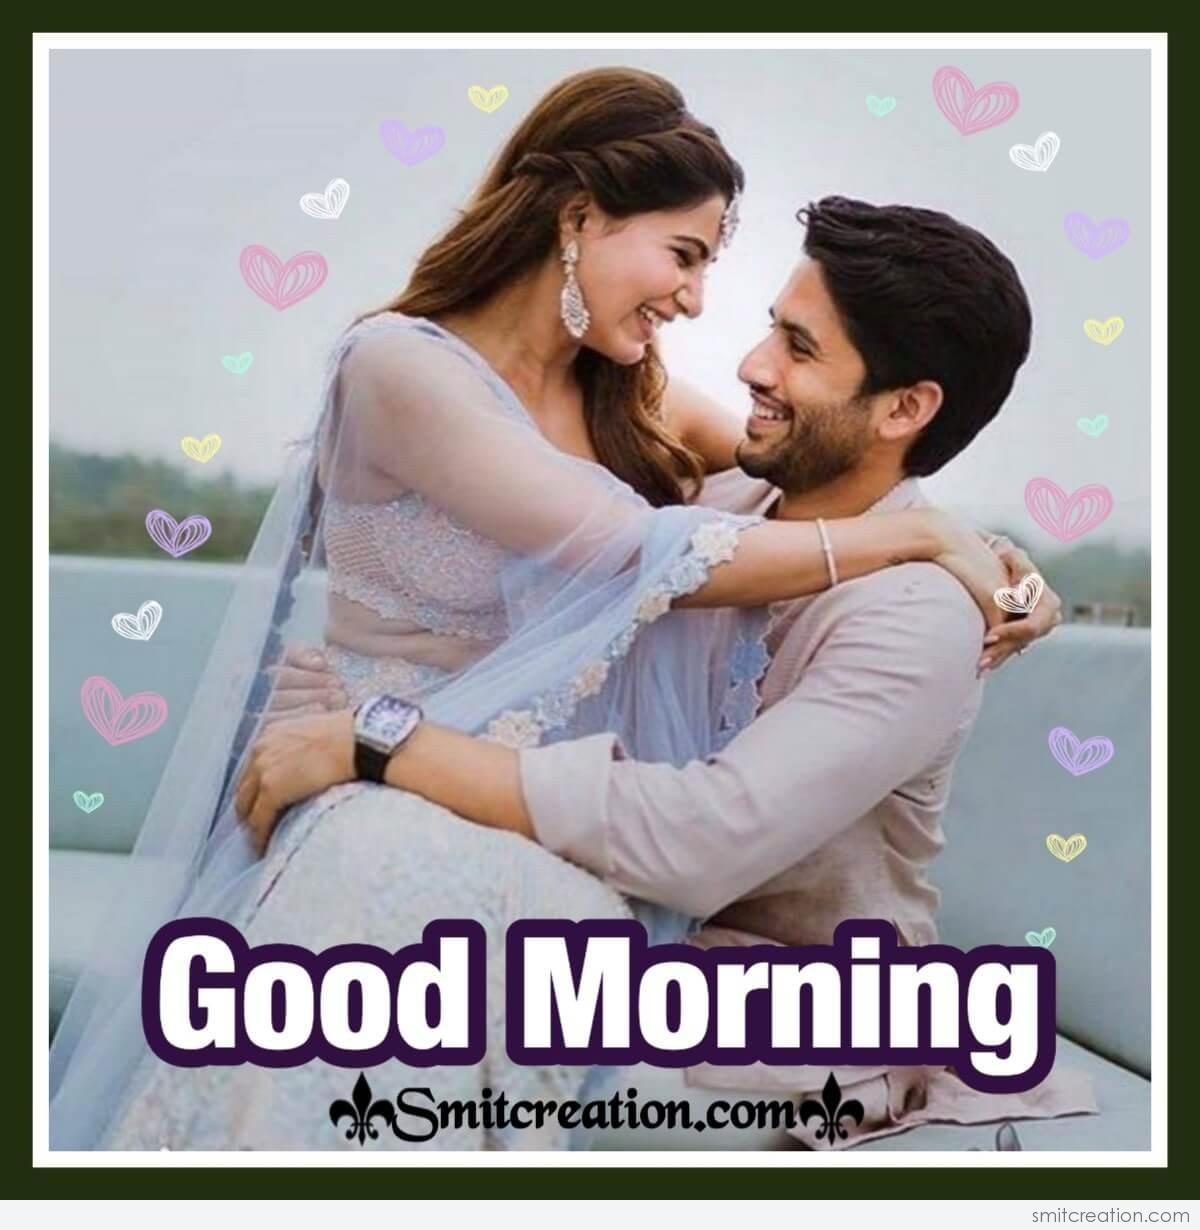 Good Morning Hugging Couple Pic Smitcreation Com